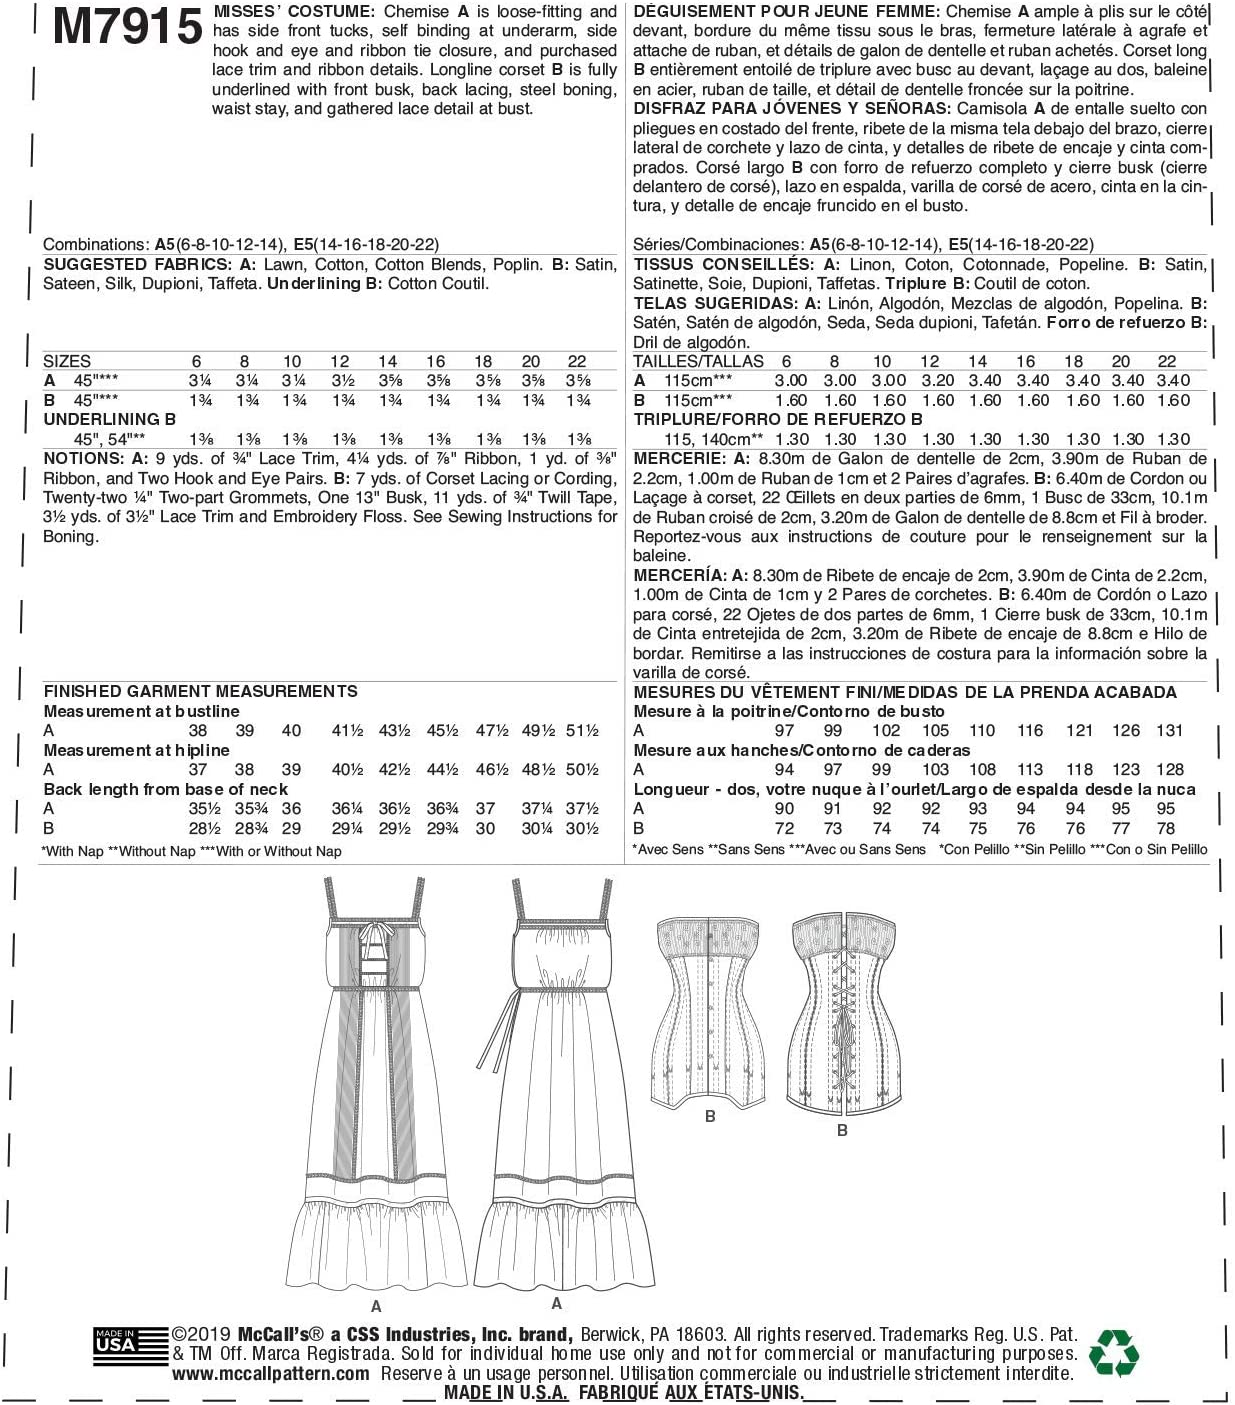 8409 PATRON McCALL/'S  8 VERSIONS CHEMISE CHIC ELEGANTE    TAILLE S AU XXXL